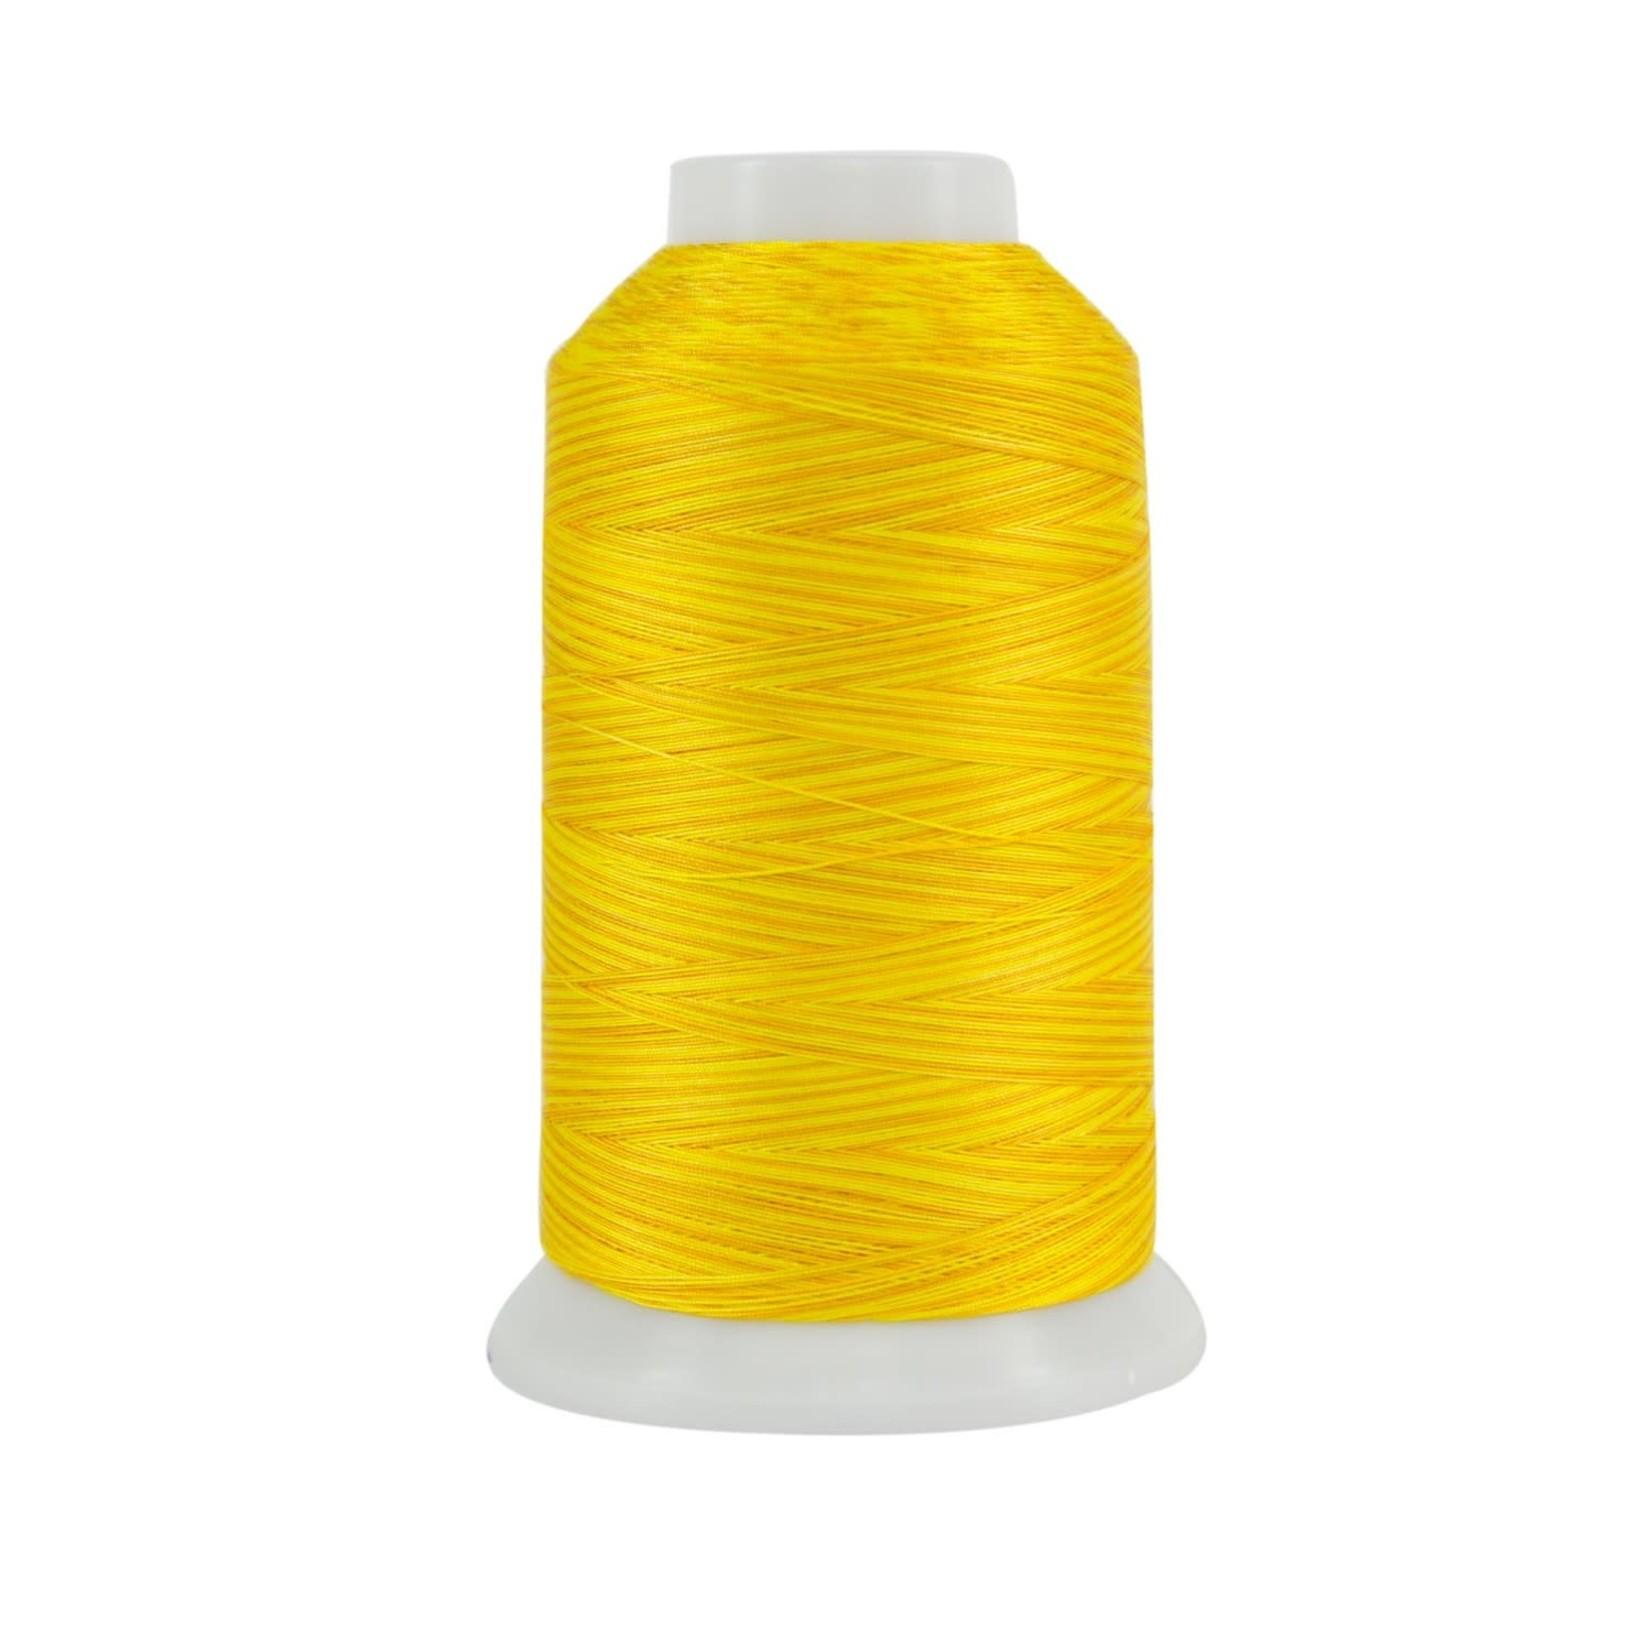 Superior Threads King Tut - #40 - 1828 m - 0985 Shekels